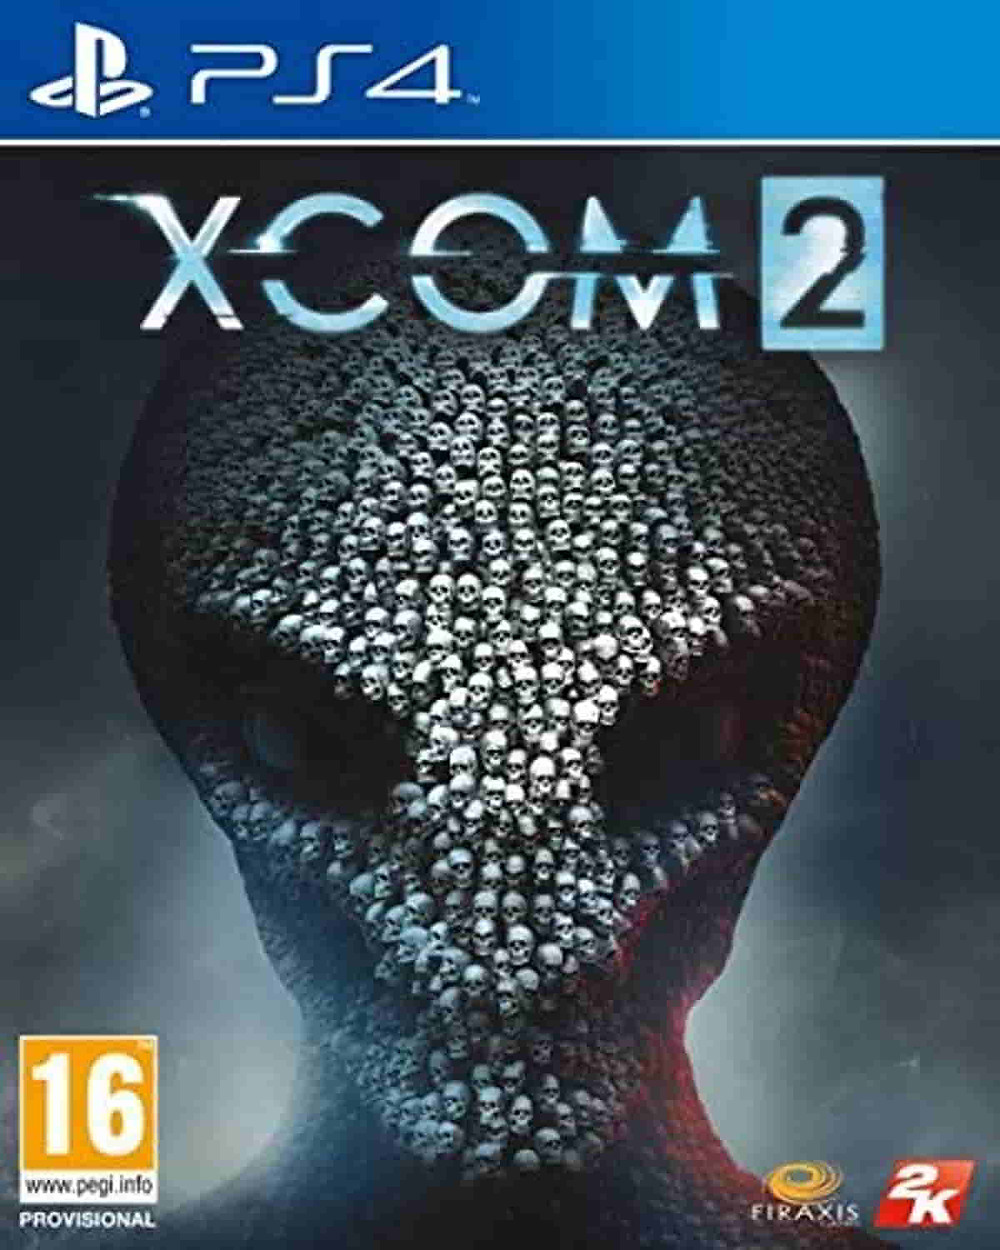 Juegos estrategia PS4 Xcom 2: War of the Chosen